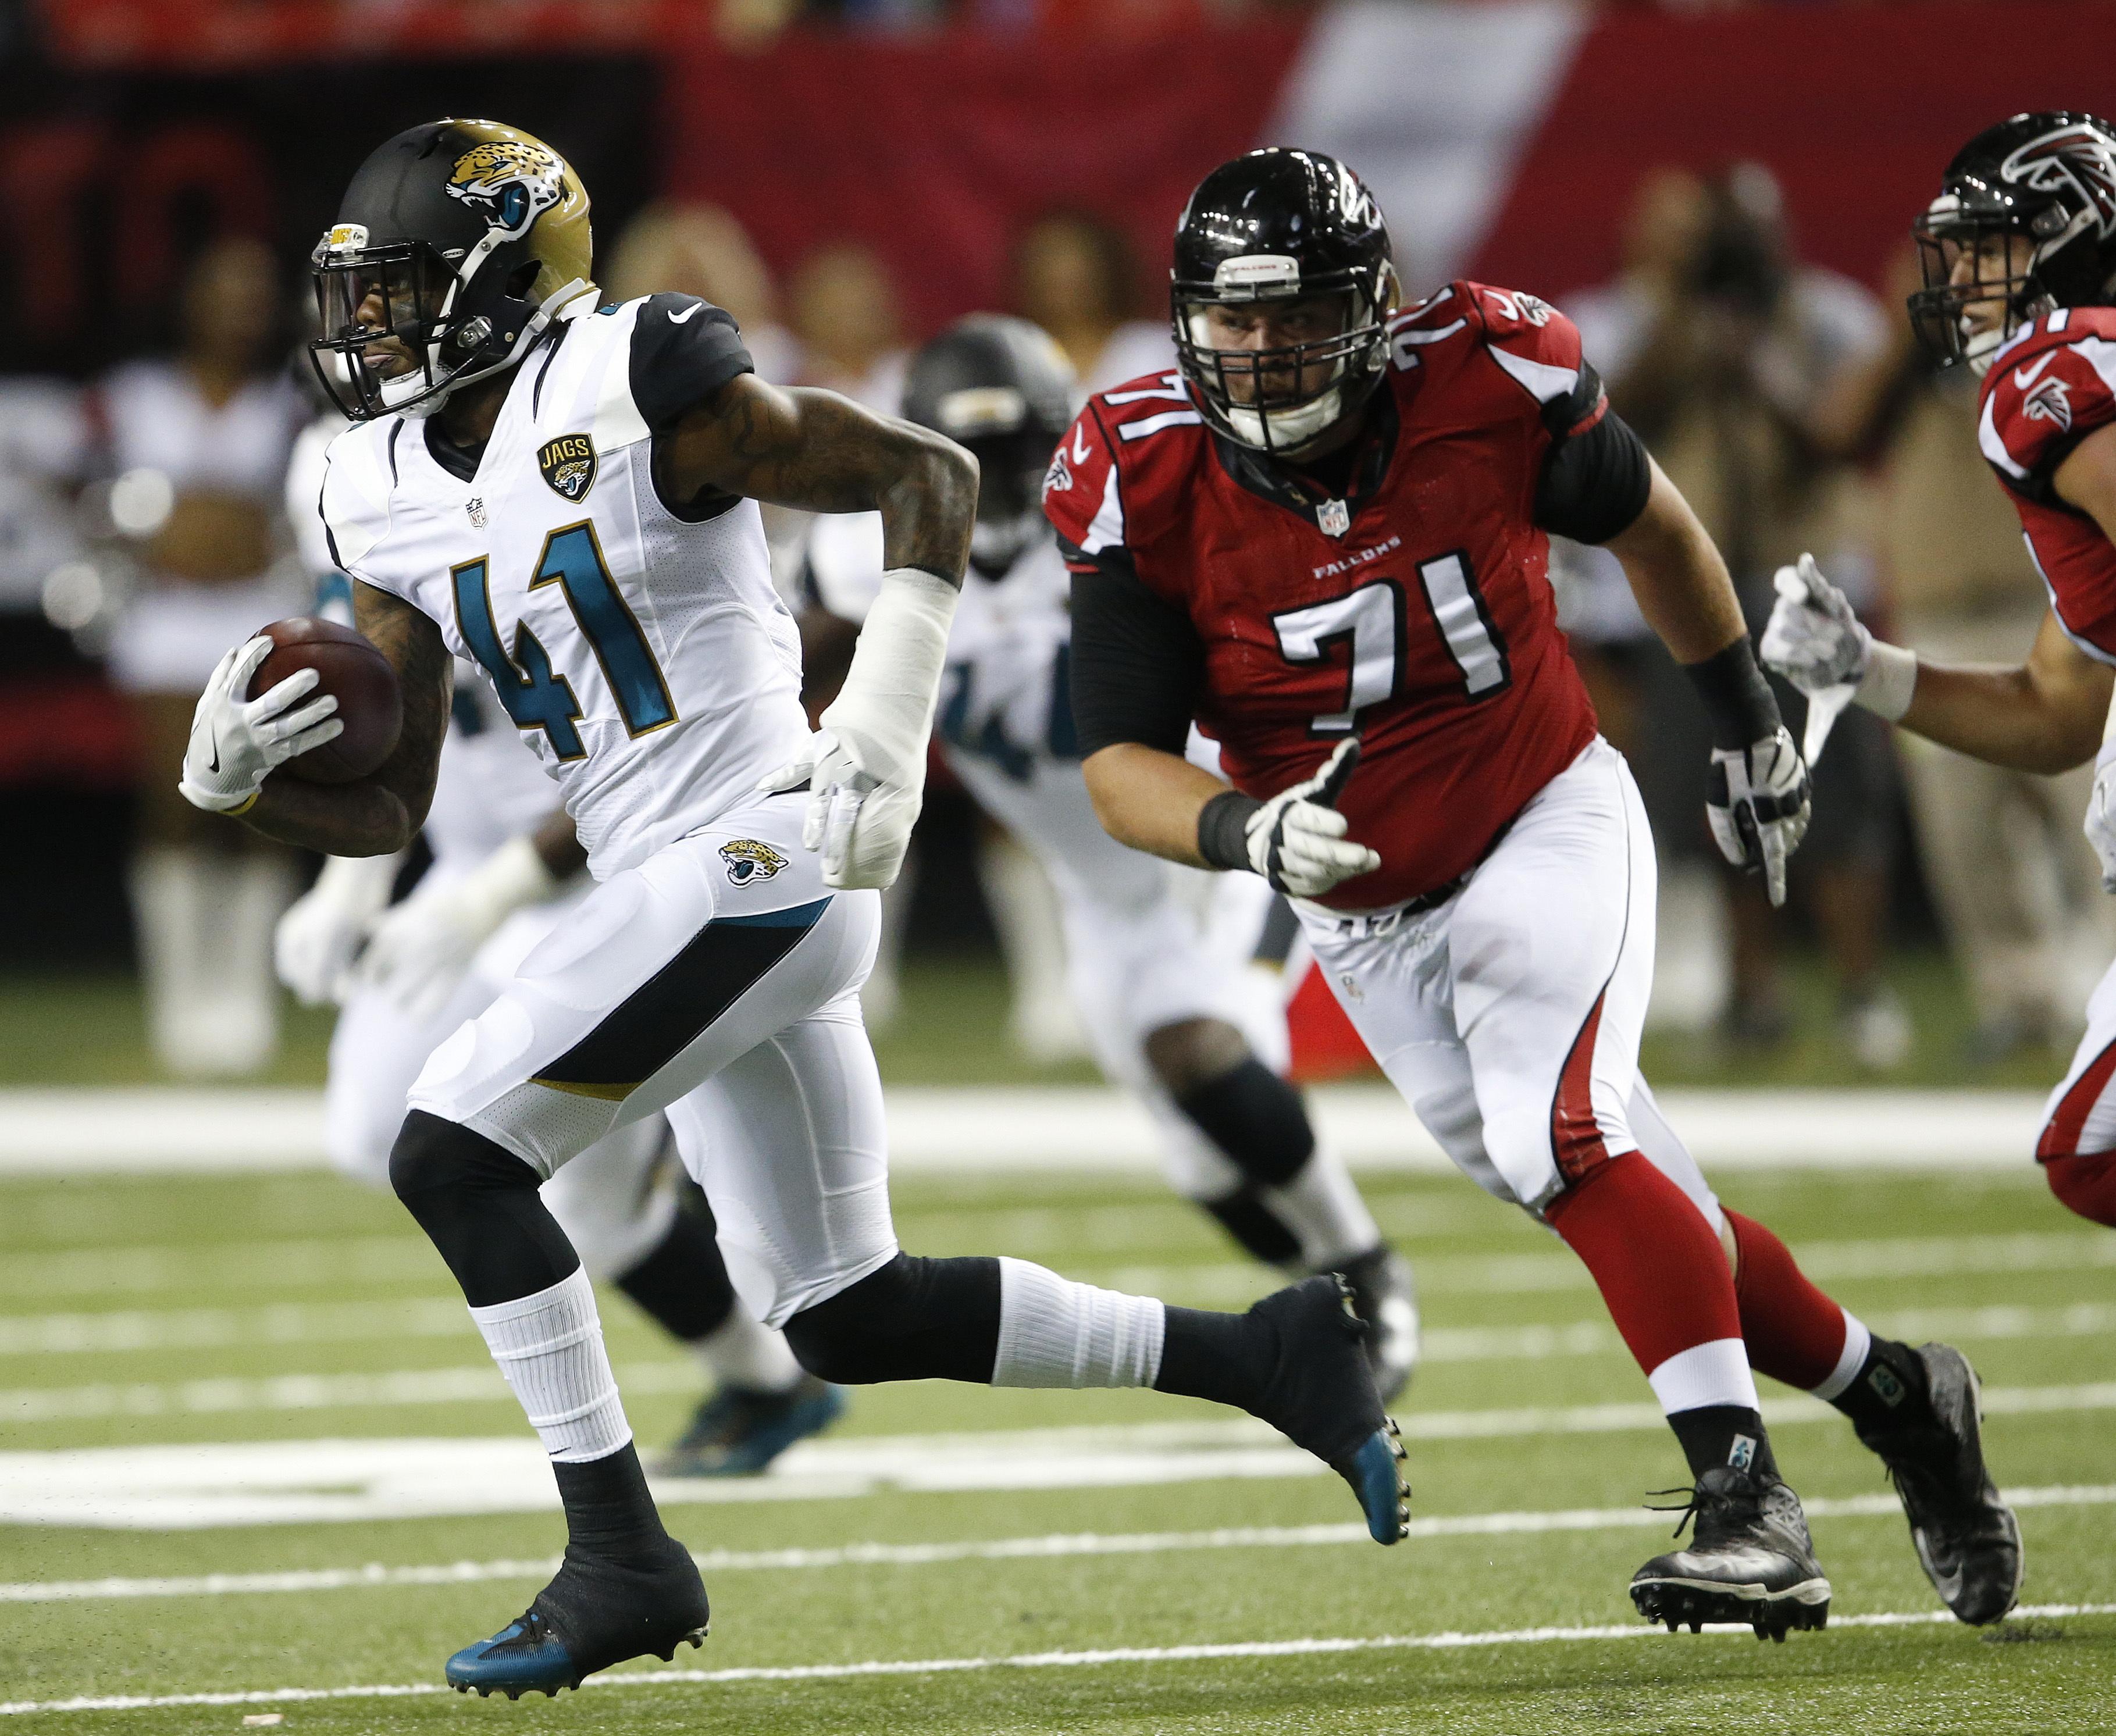 Jacksonville Jaguars cornerback Nick Marshall (41) runs past Atlanta Falcons offensive guard Wes Schweitzer (71) during the first half of a preseason NFL football game, Thursday, Sept. 1, 2016, in Atlanta. (AP Photo/John Bazemore)